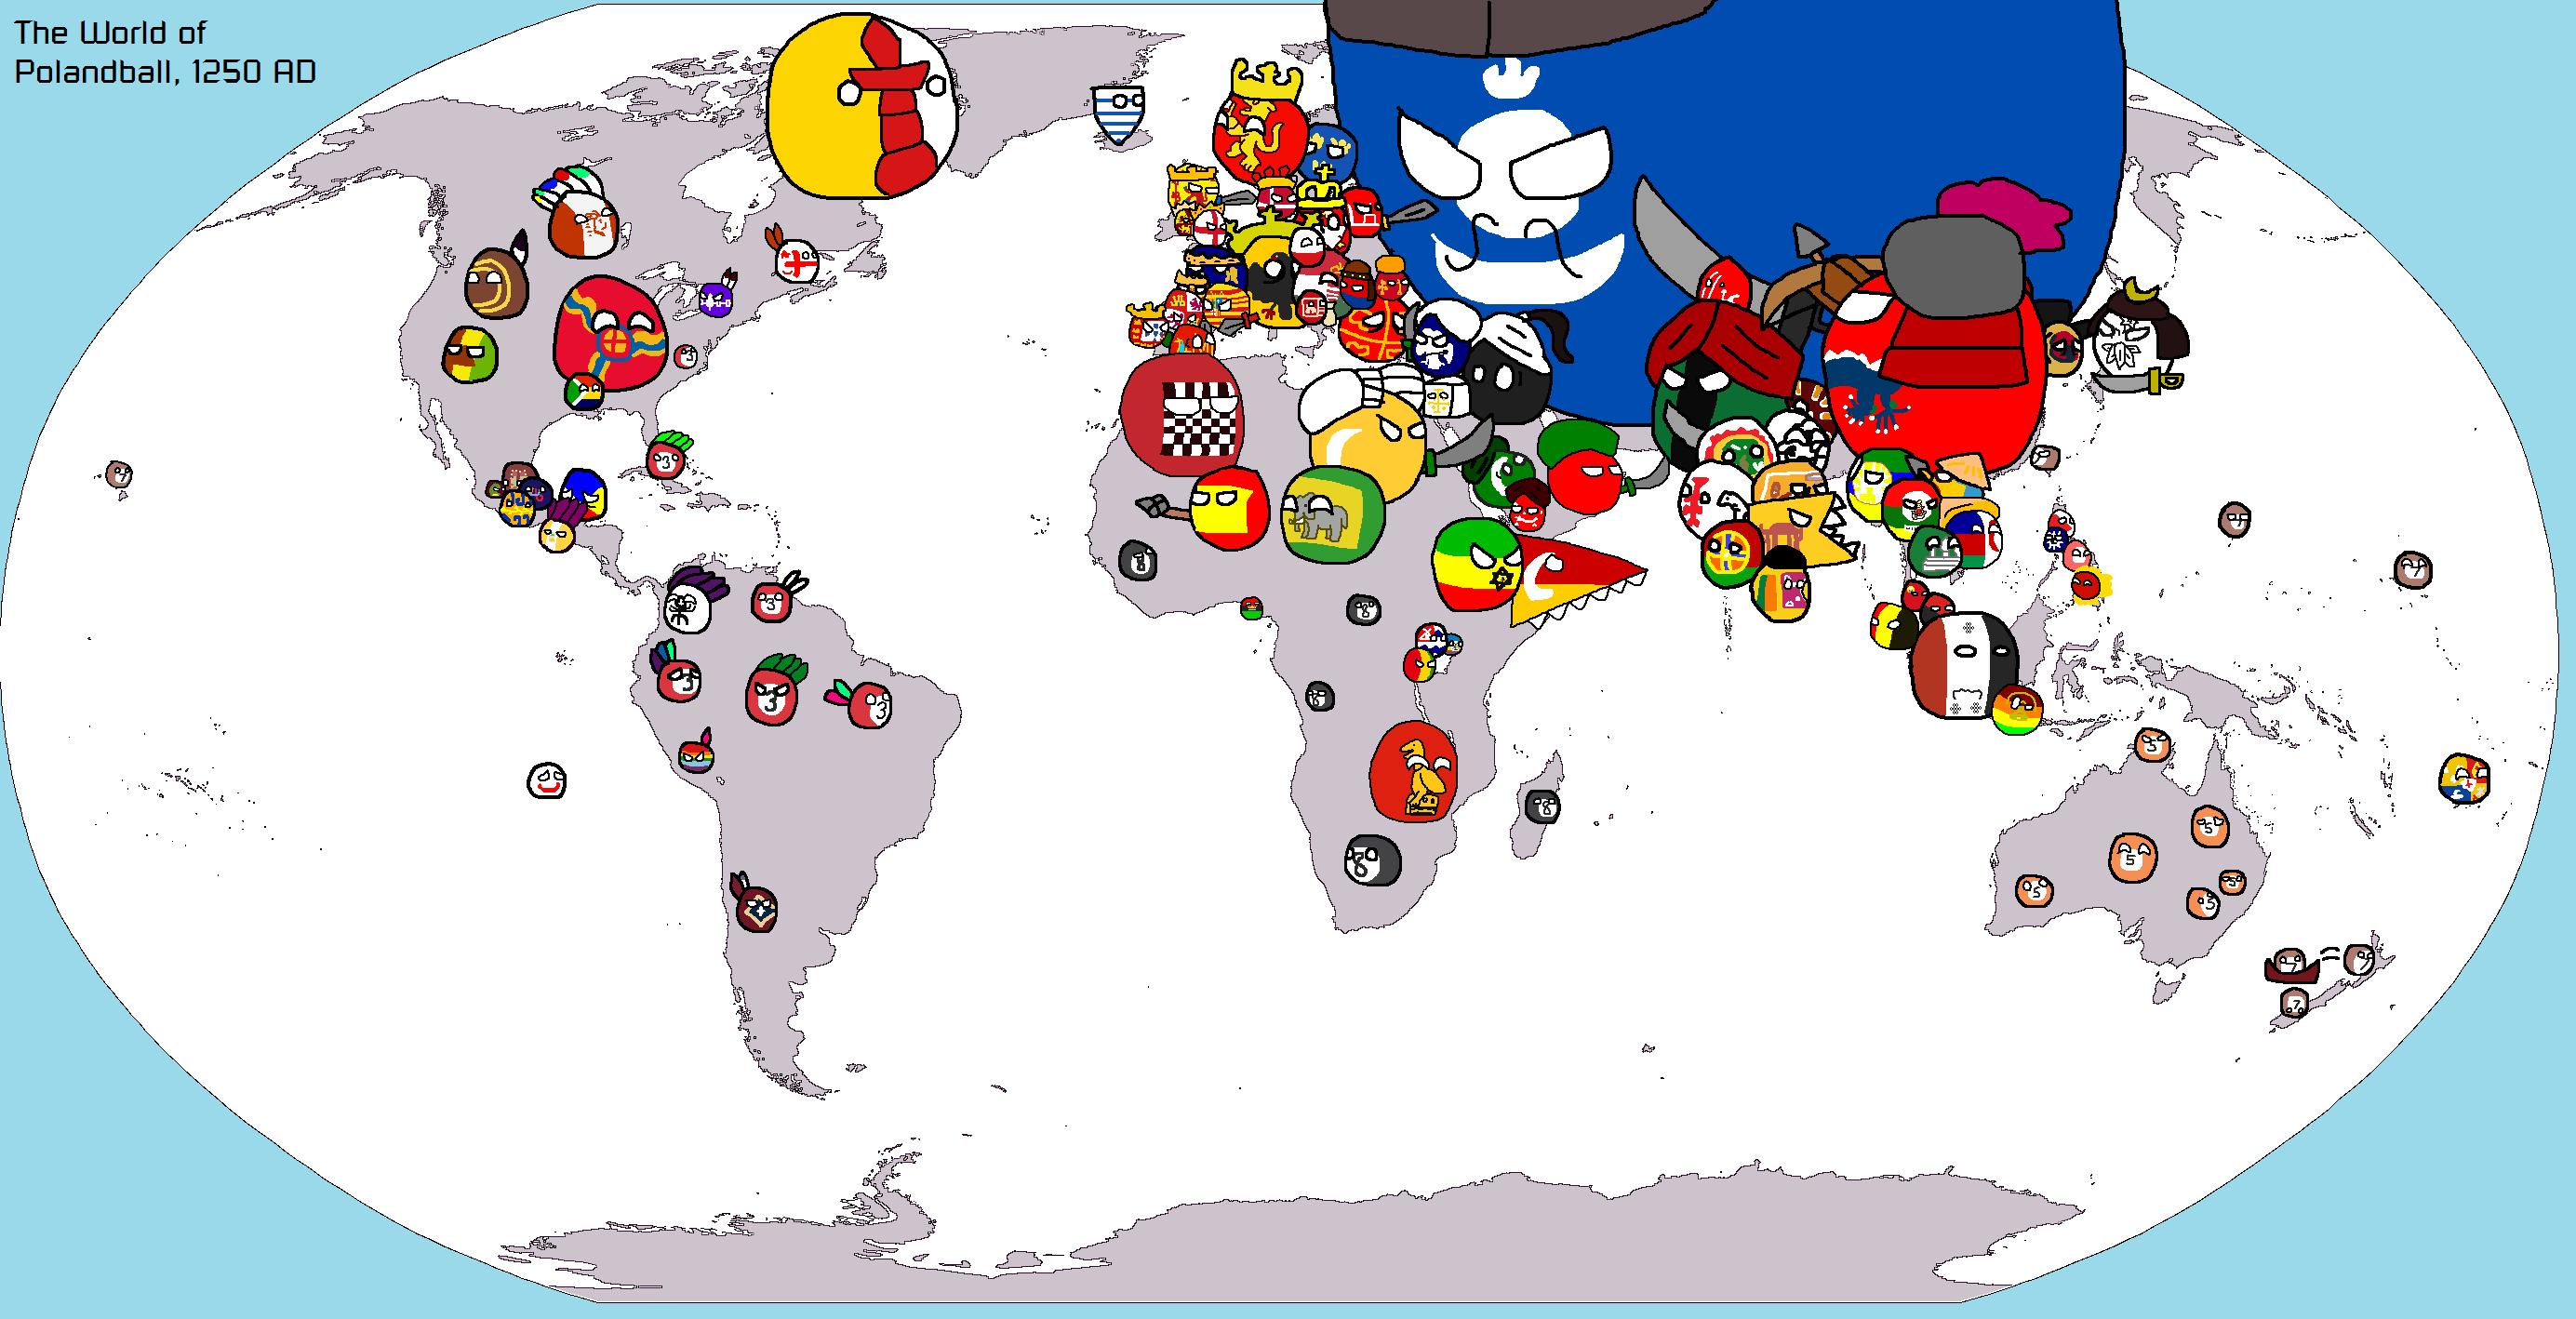 polandball map of earth 1250 ad by ragameechu on deviantart